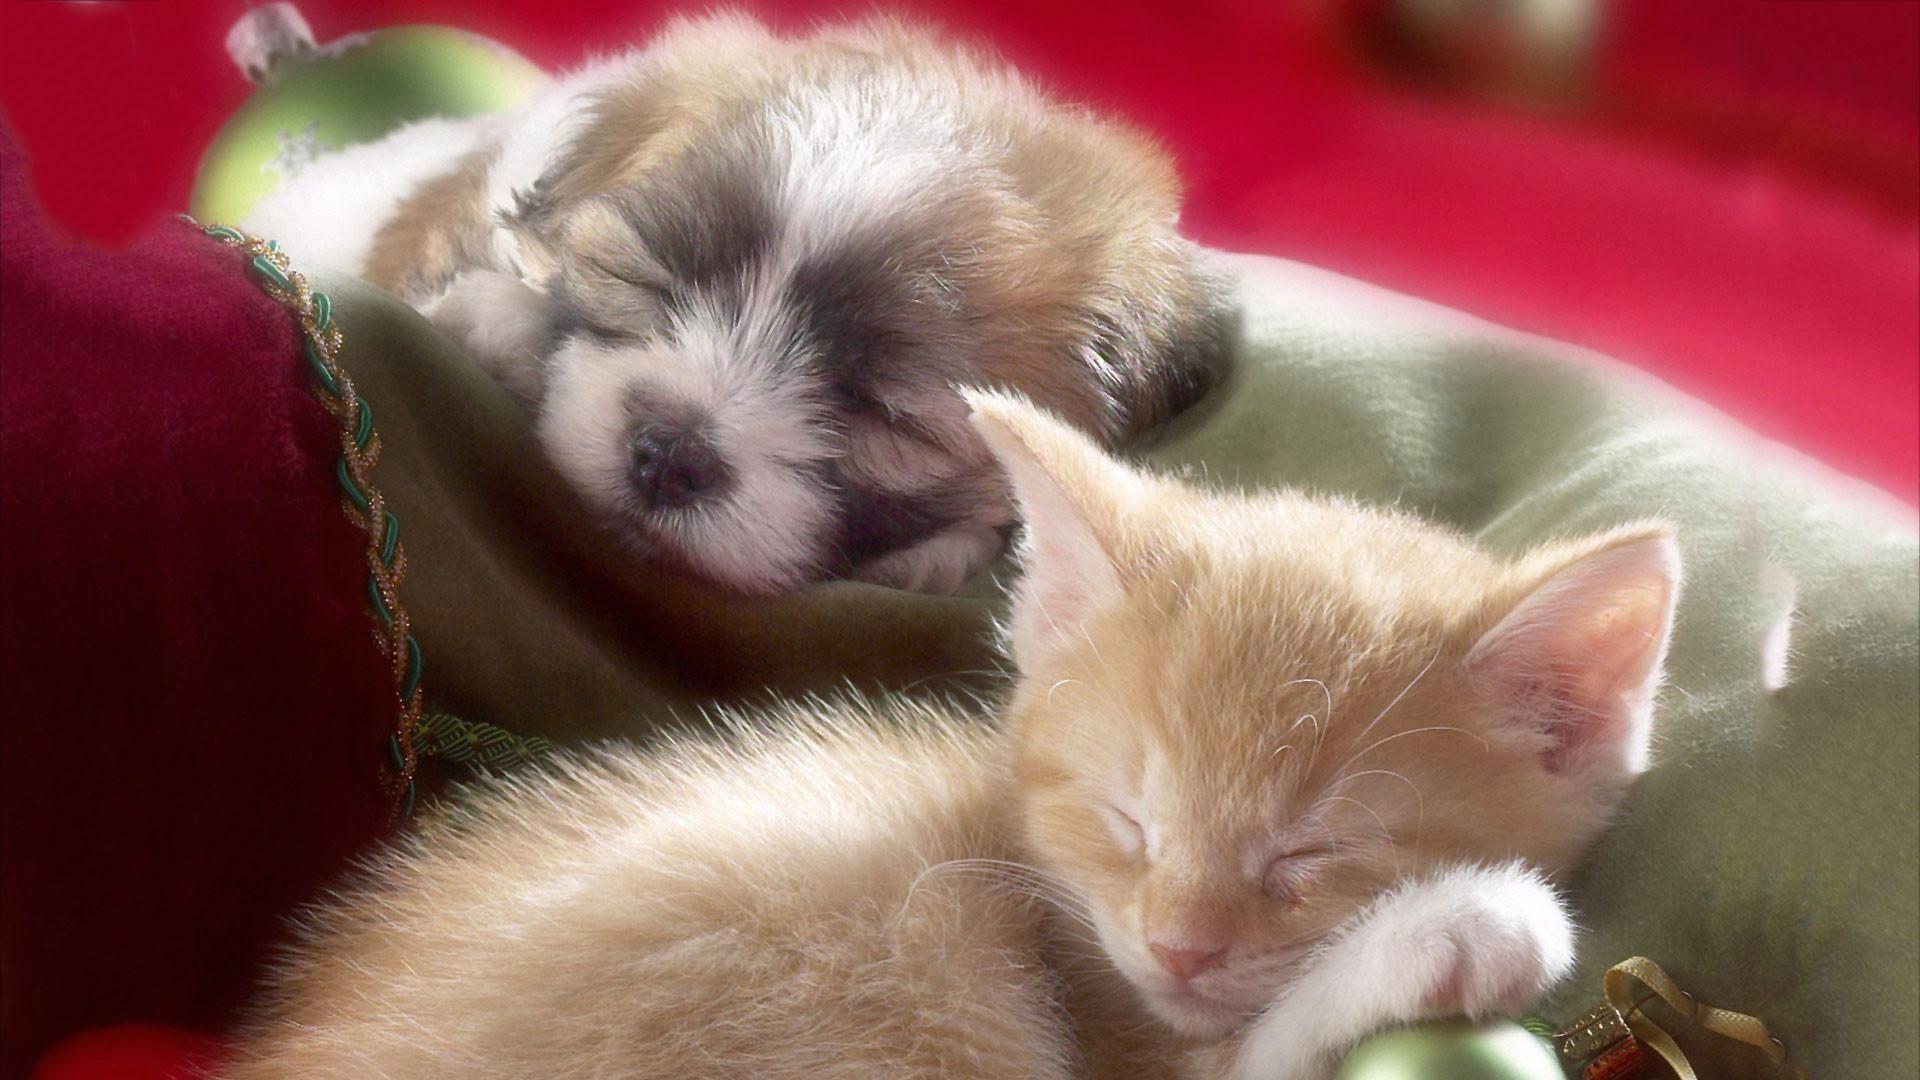 hd pics photos attractive christmas pets kitten puppy cat dog sleeping  beautiful nice hd quality desktop